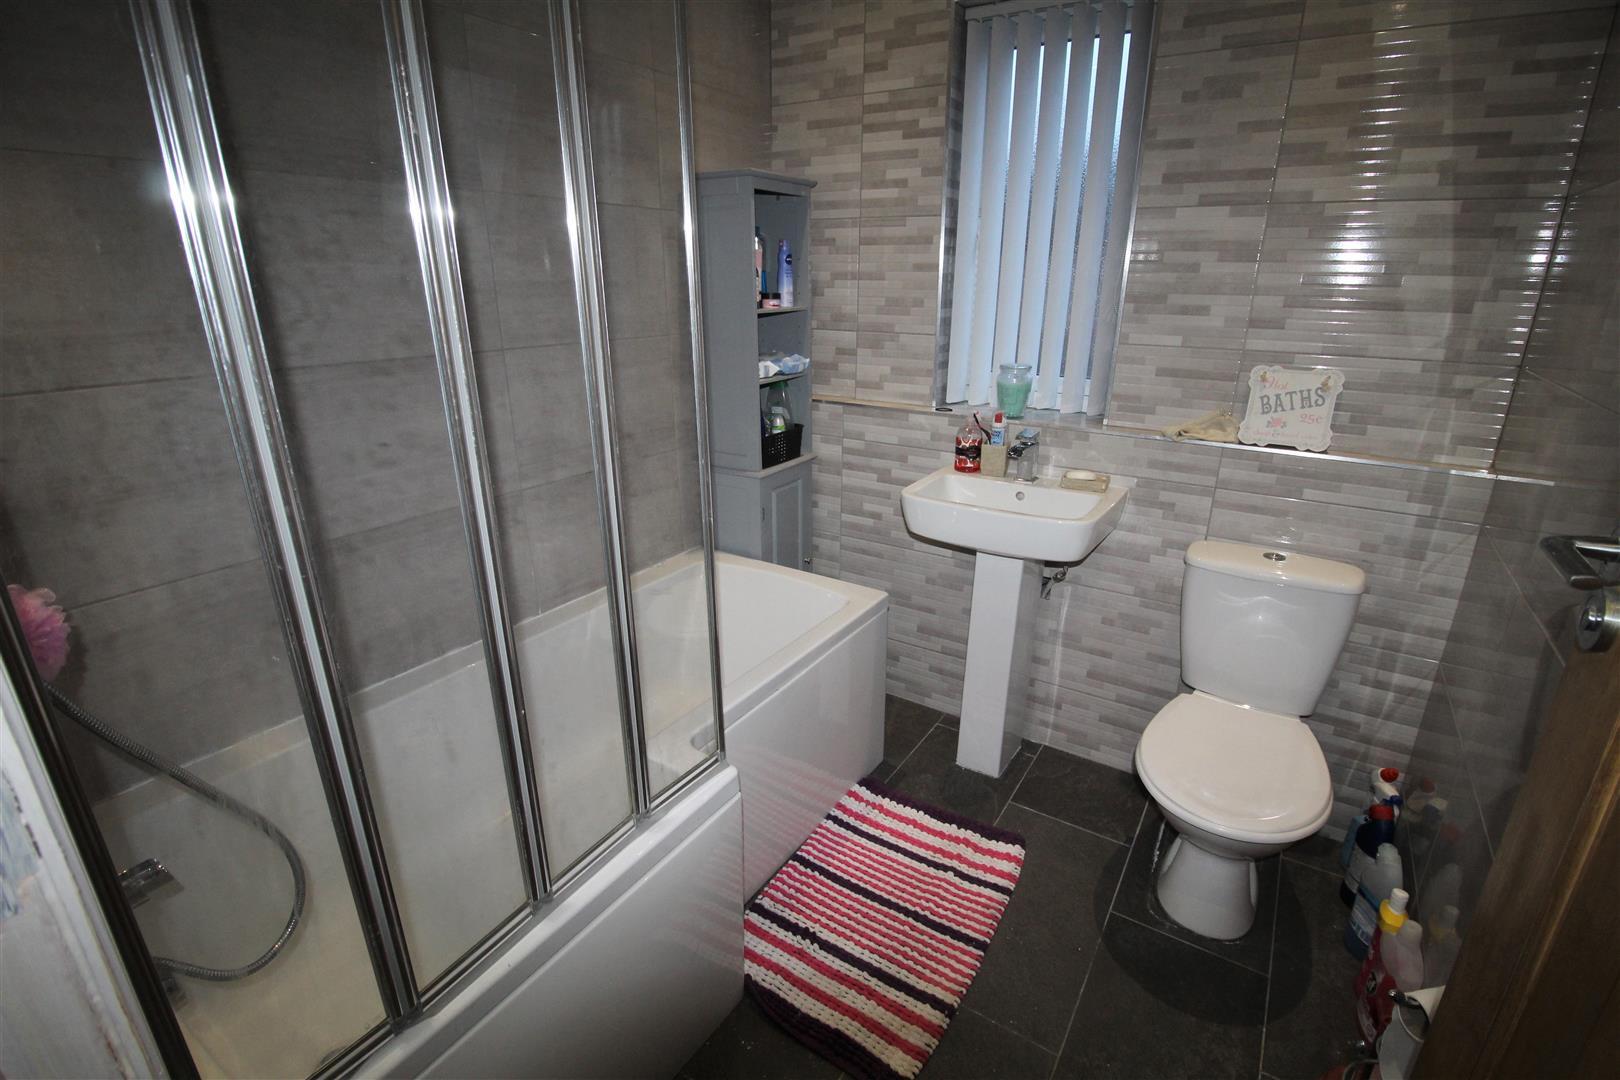 4 Bedrooms, House - Terraced, Trevor Road, Liverpool